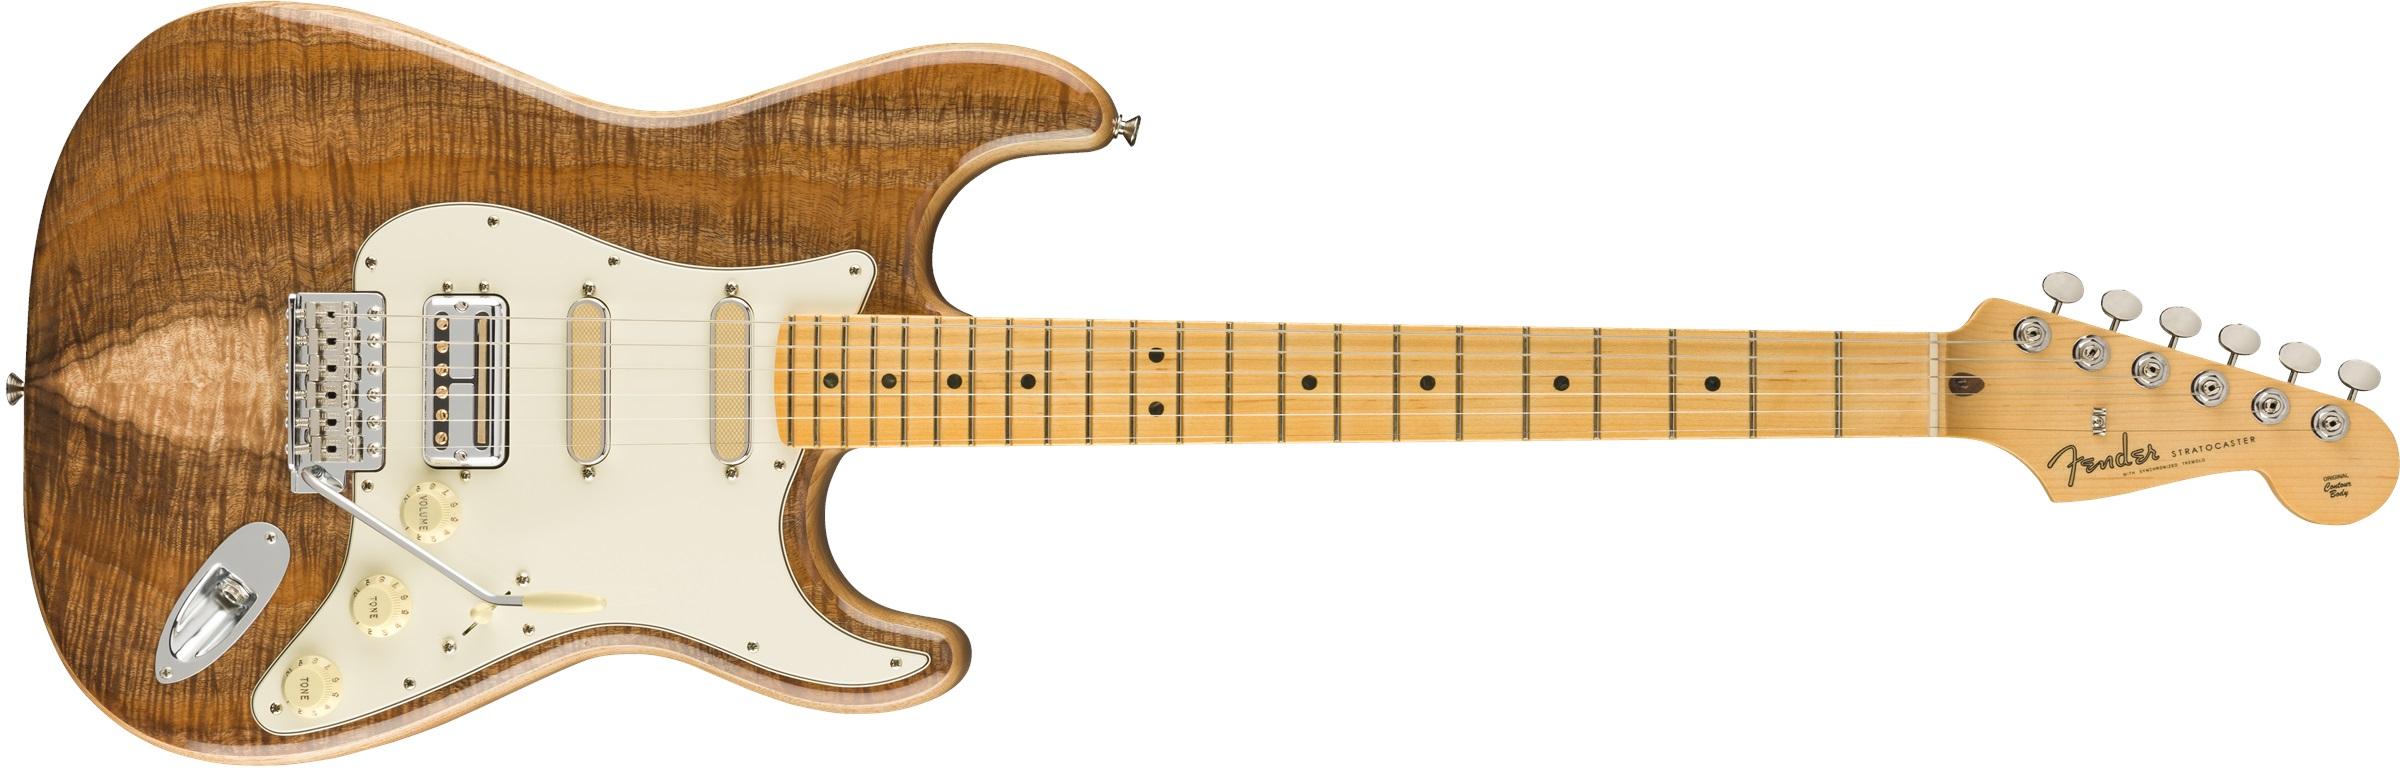 Fender Rarities Flame Koa Top Stratocaste MN NA